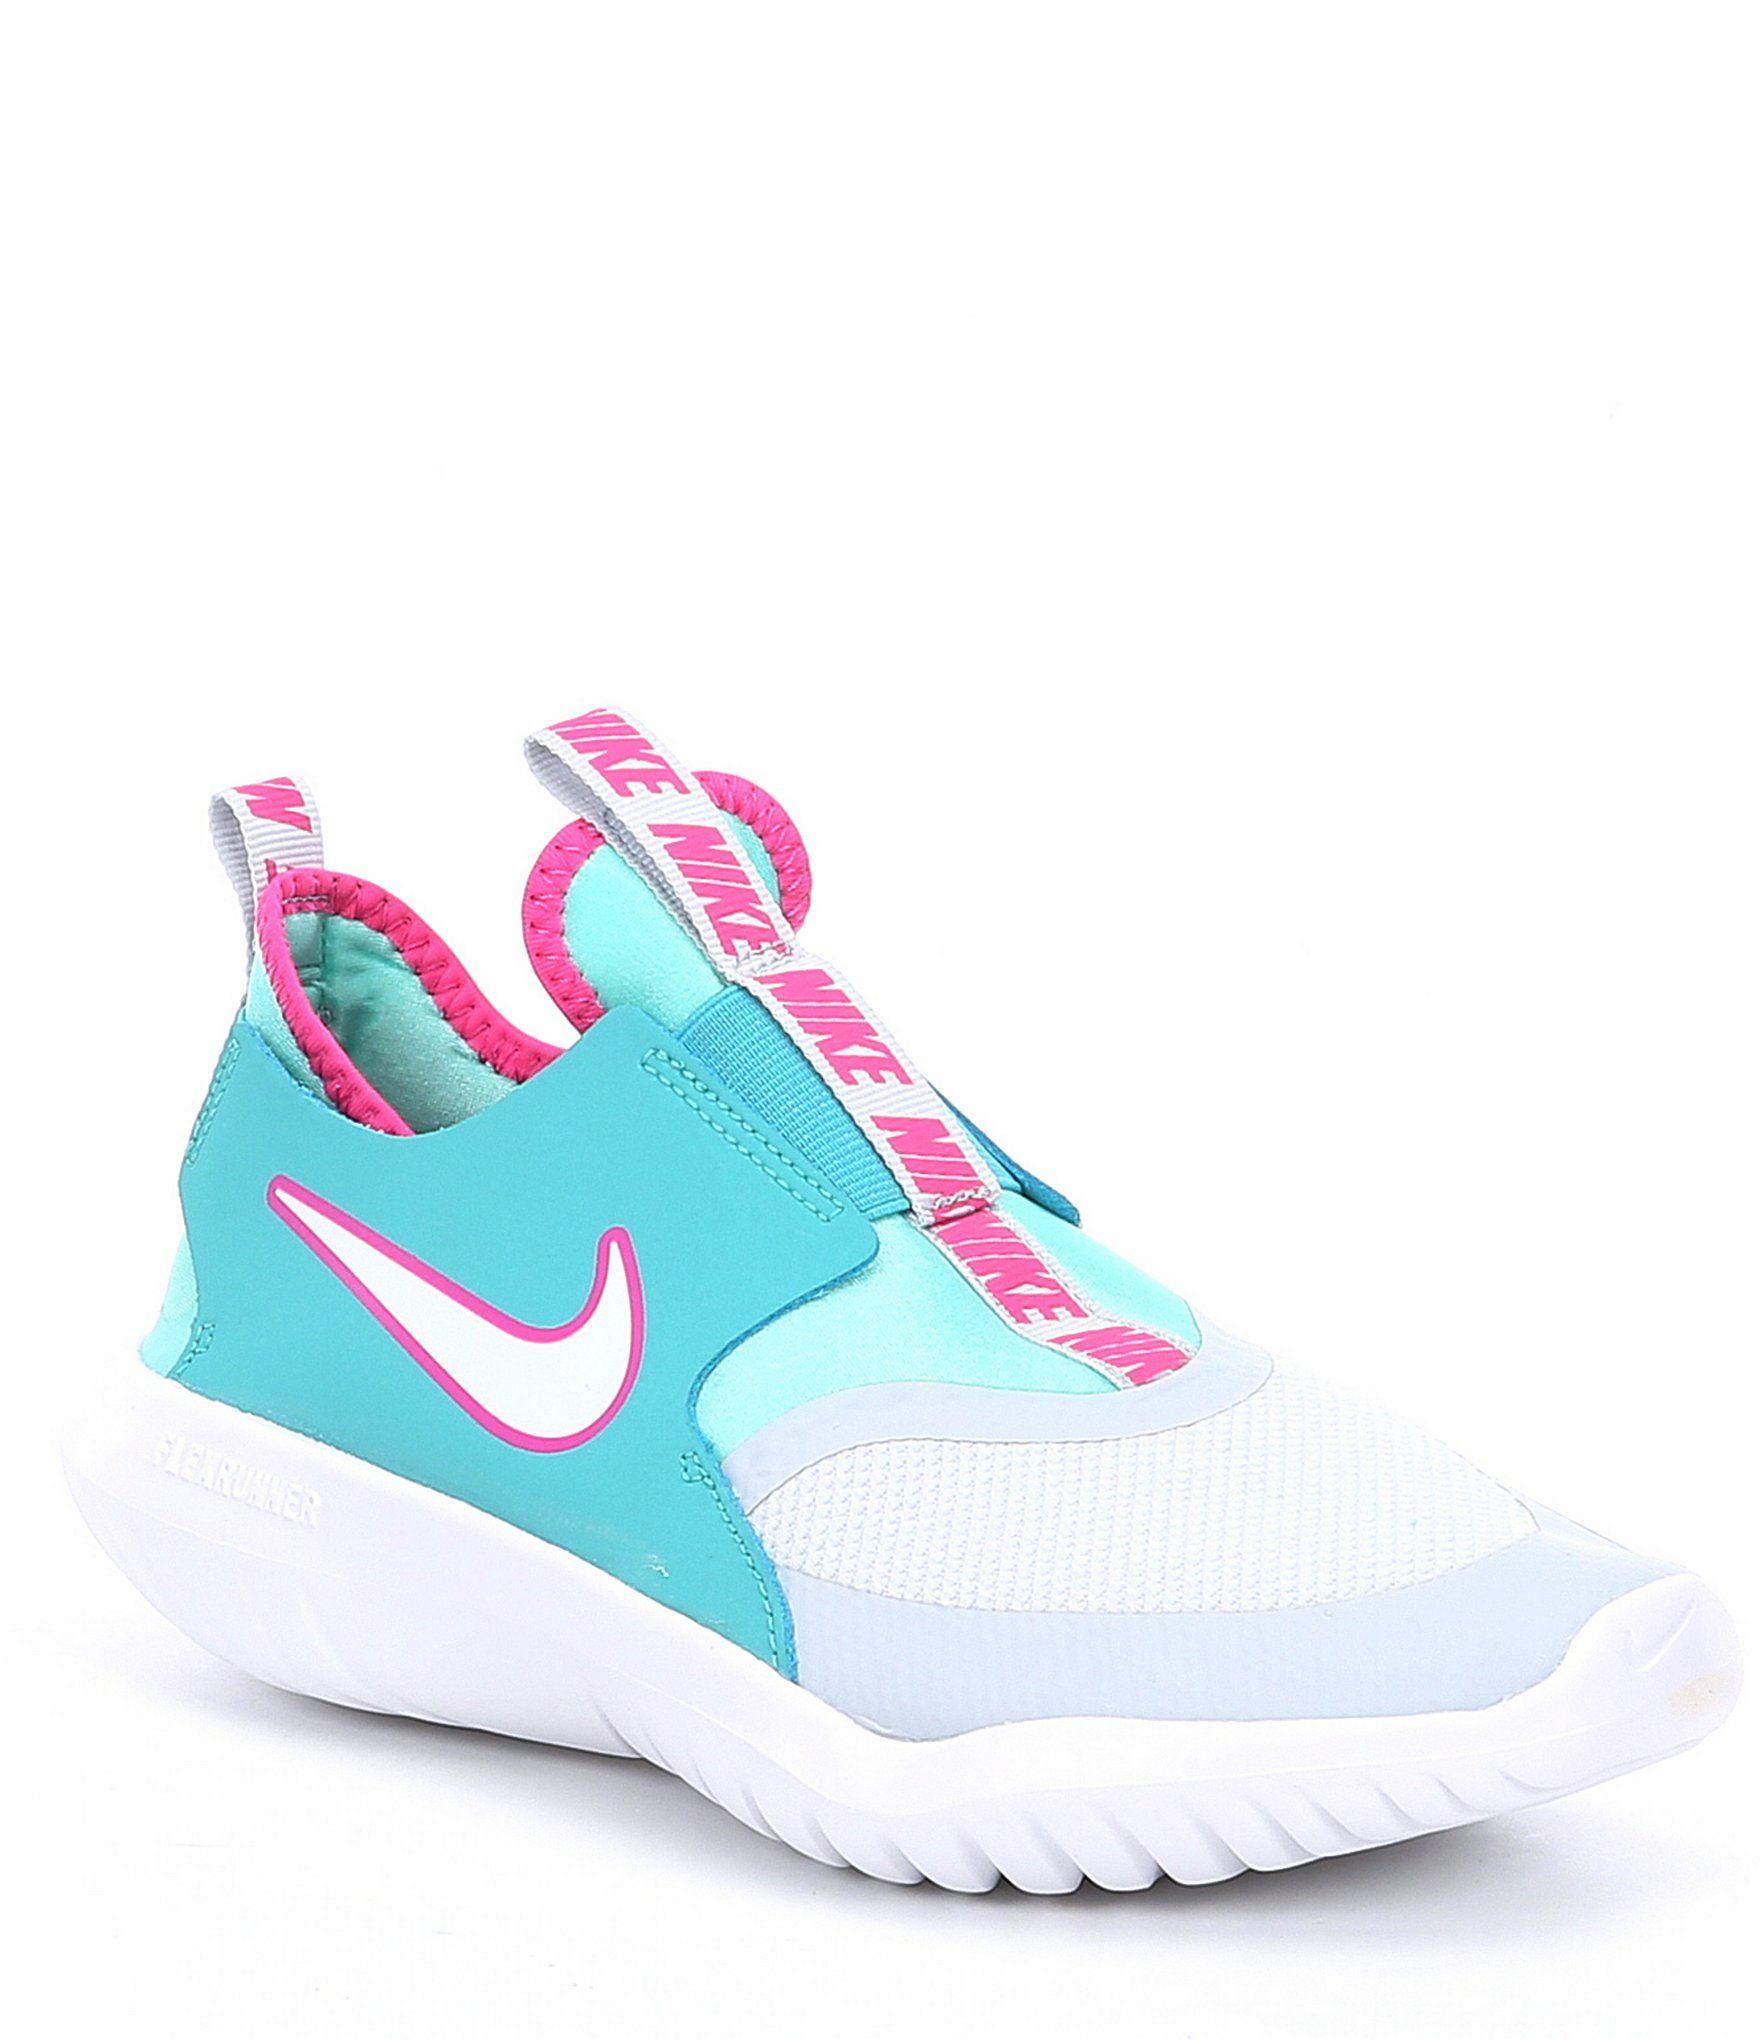 dillards nike shoes